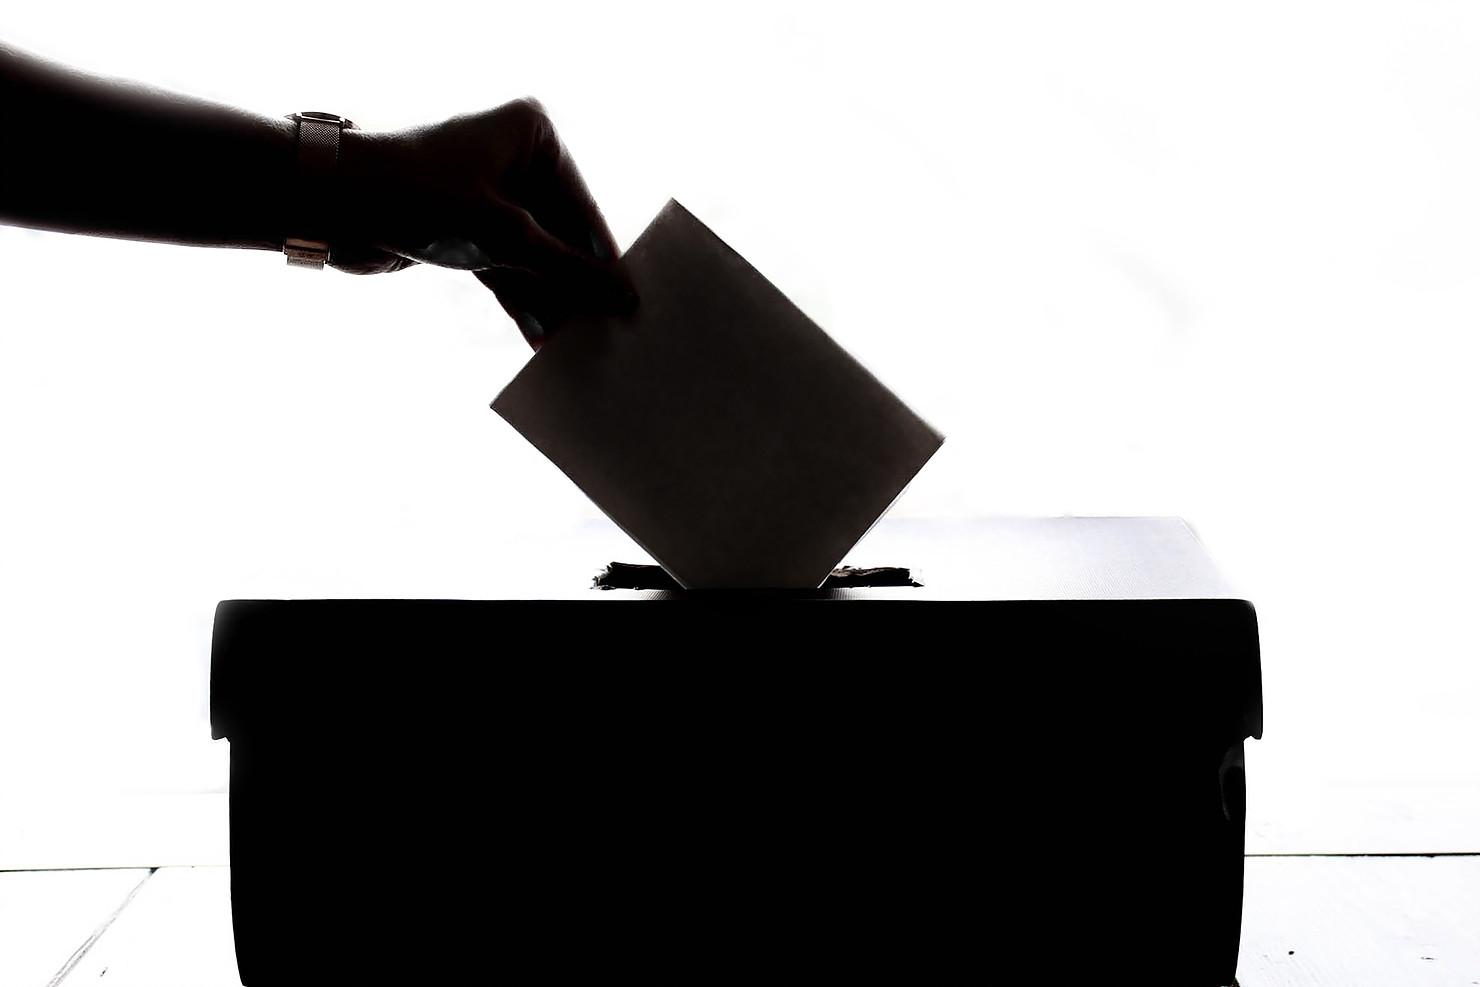 Une enveloppe qui vote dans une urne